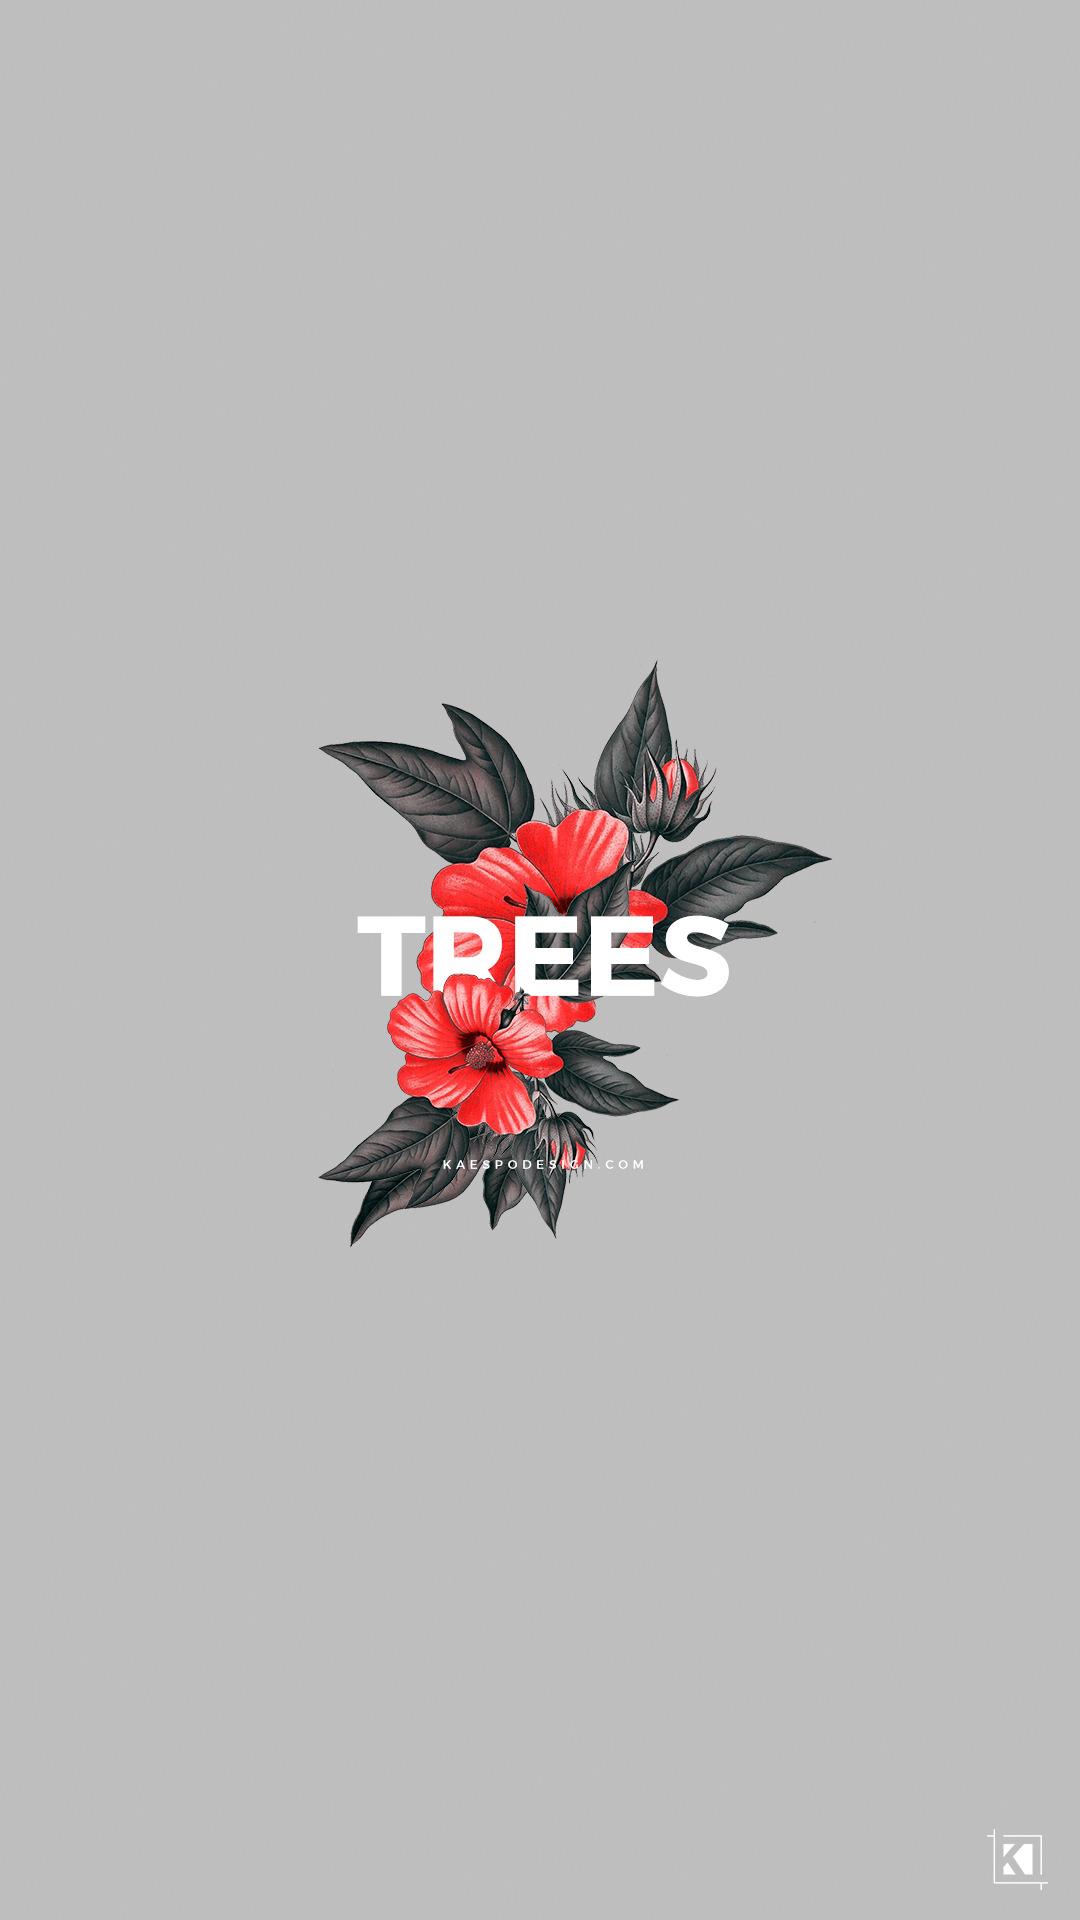 Twenty One Pilots Lyrics by KAESPO